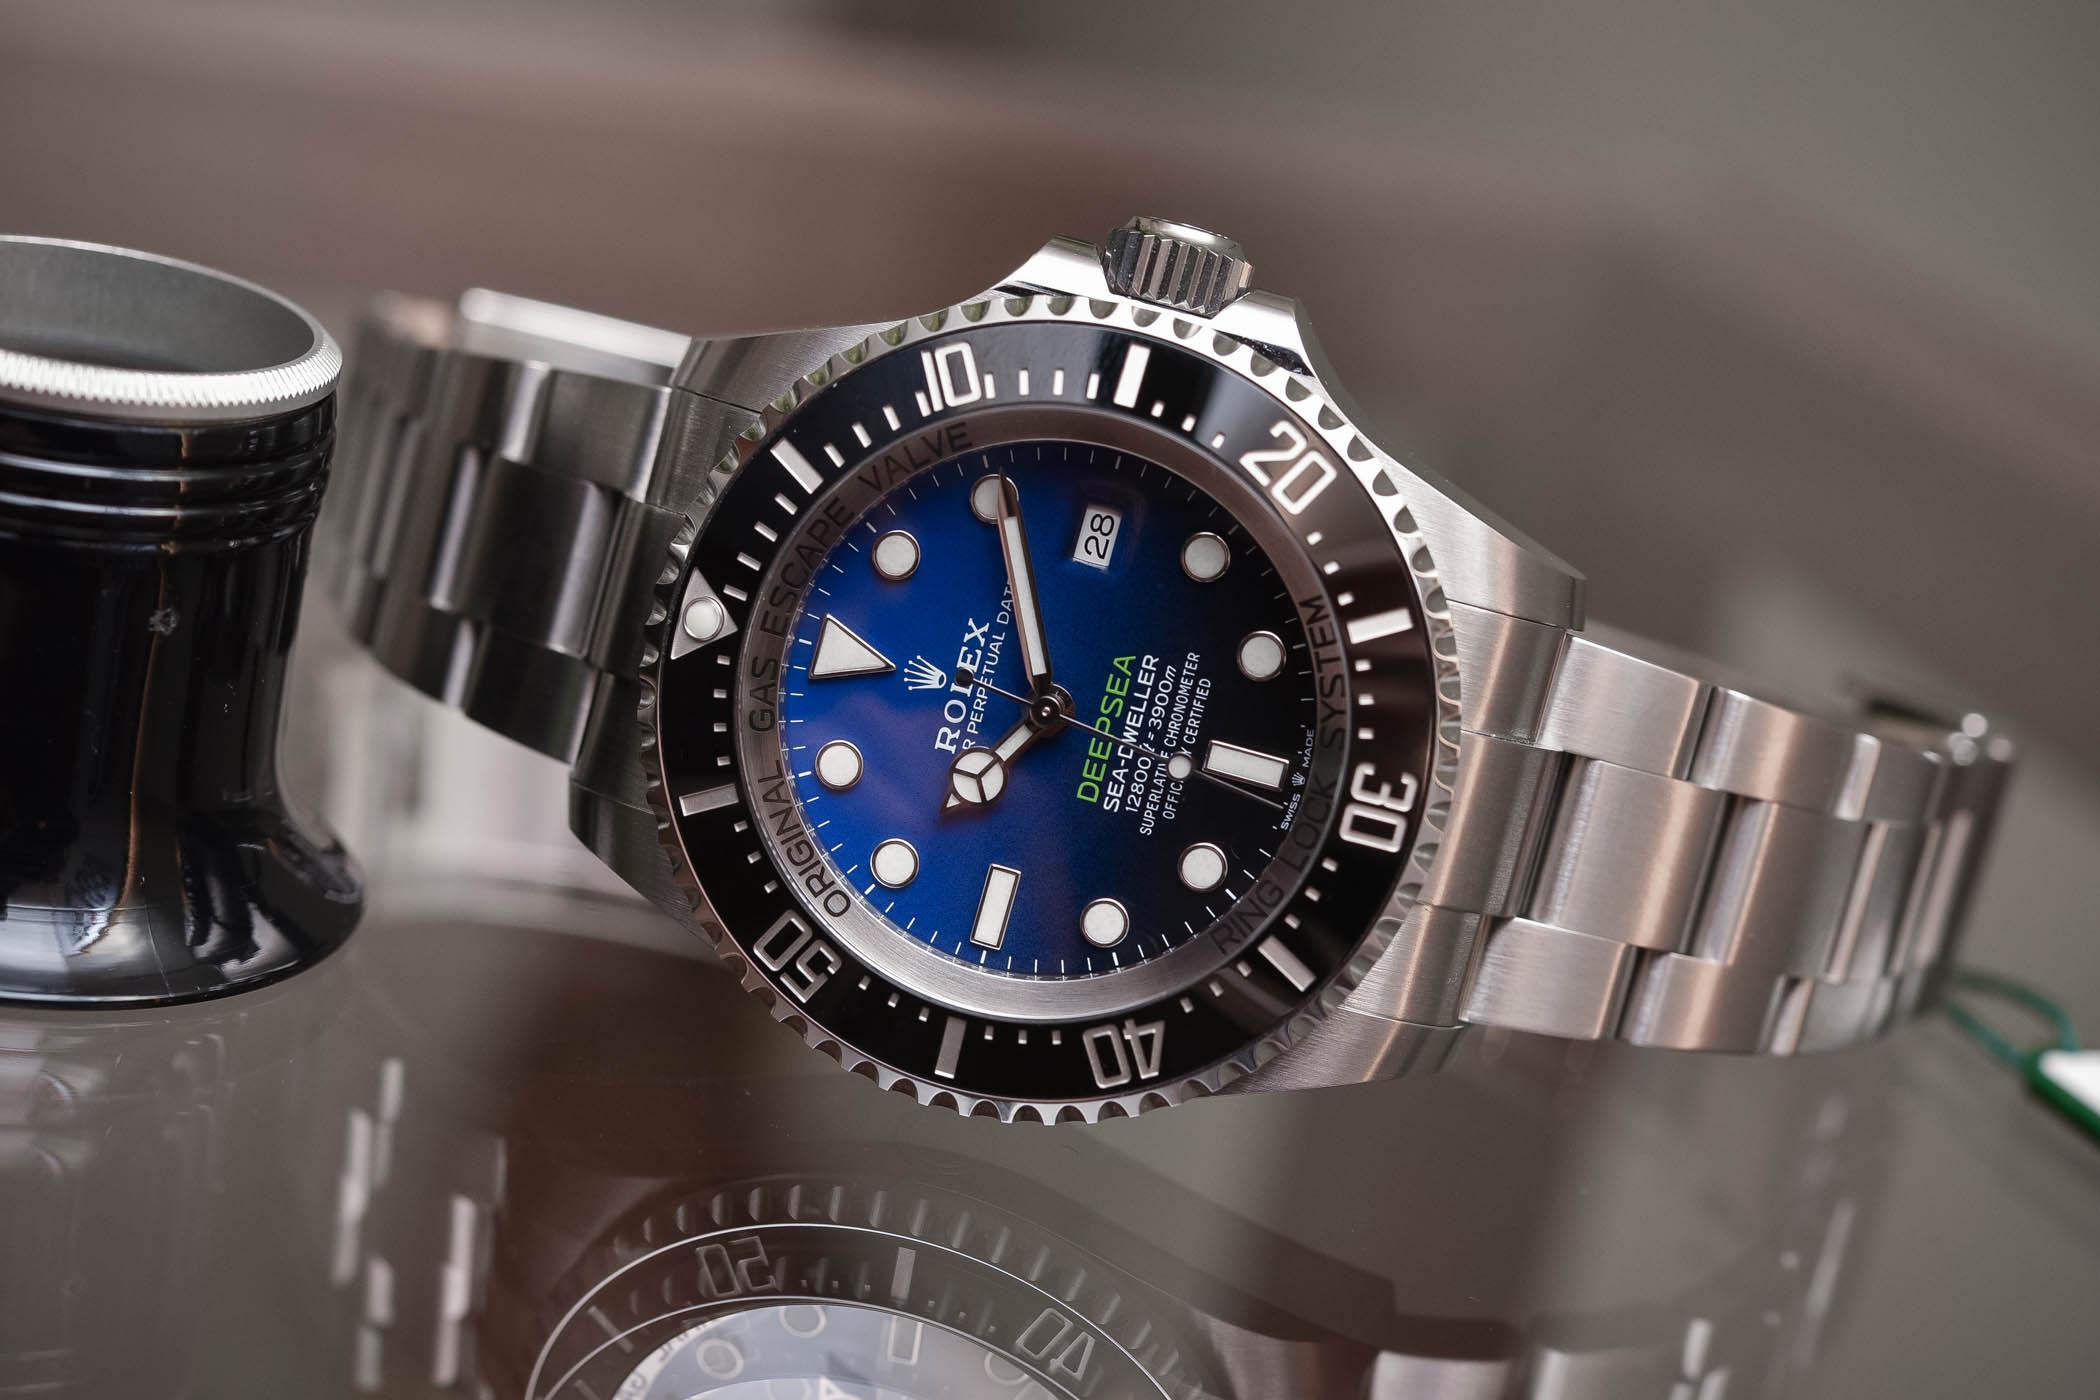 Best Dive Watches Baselworld 2018 - Rolex Deepsea 126660